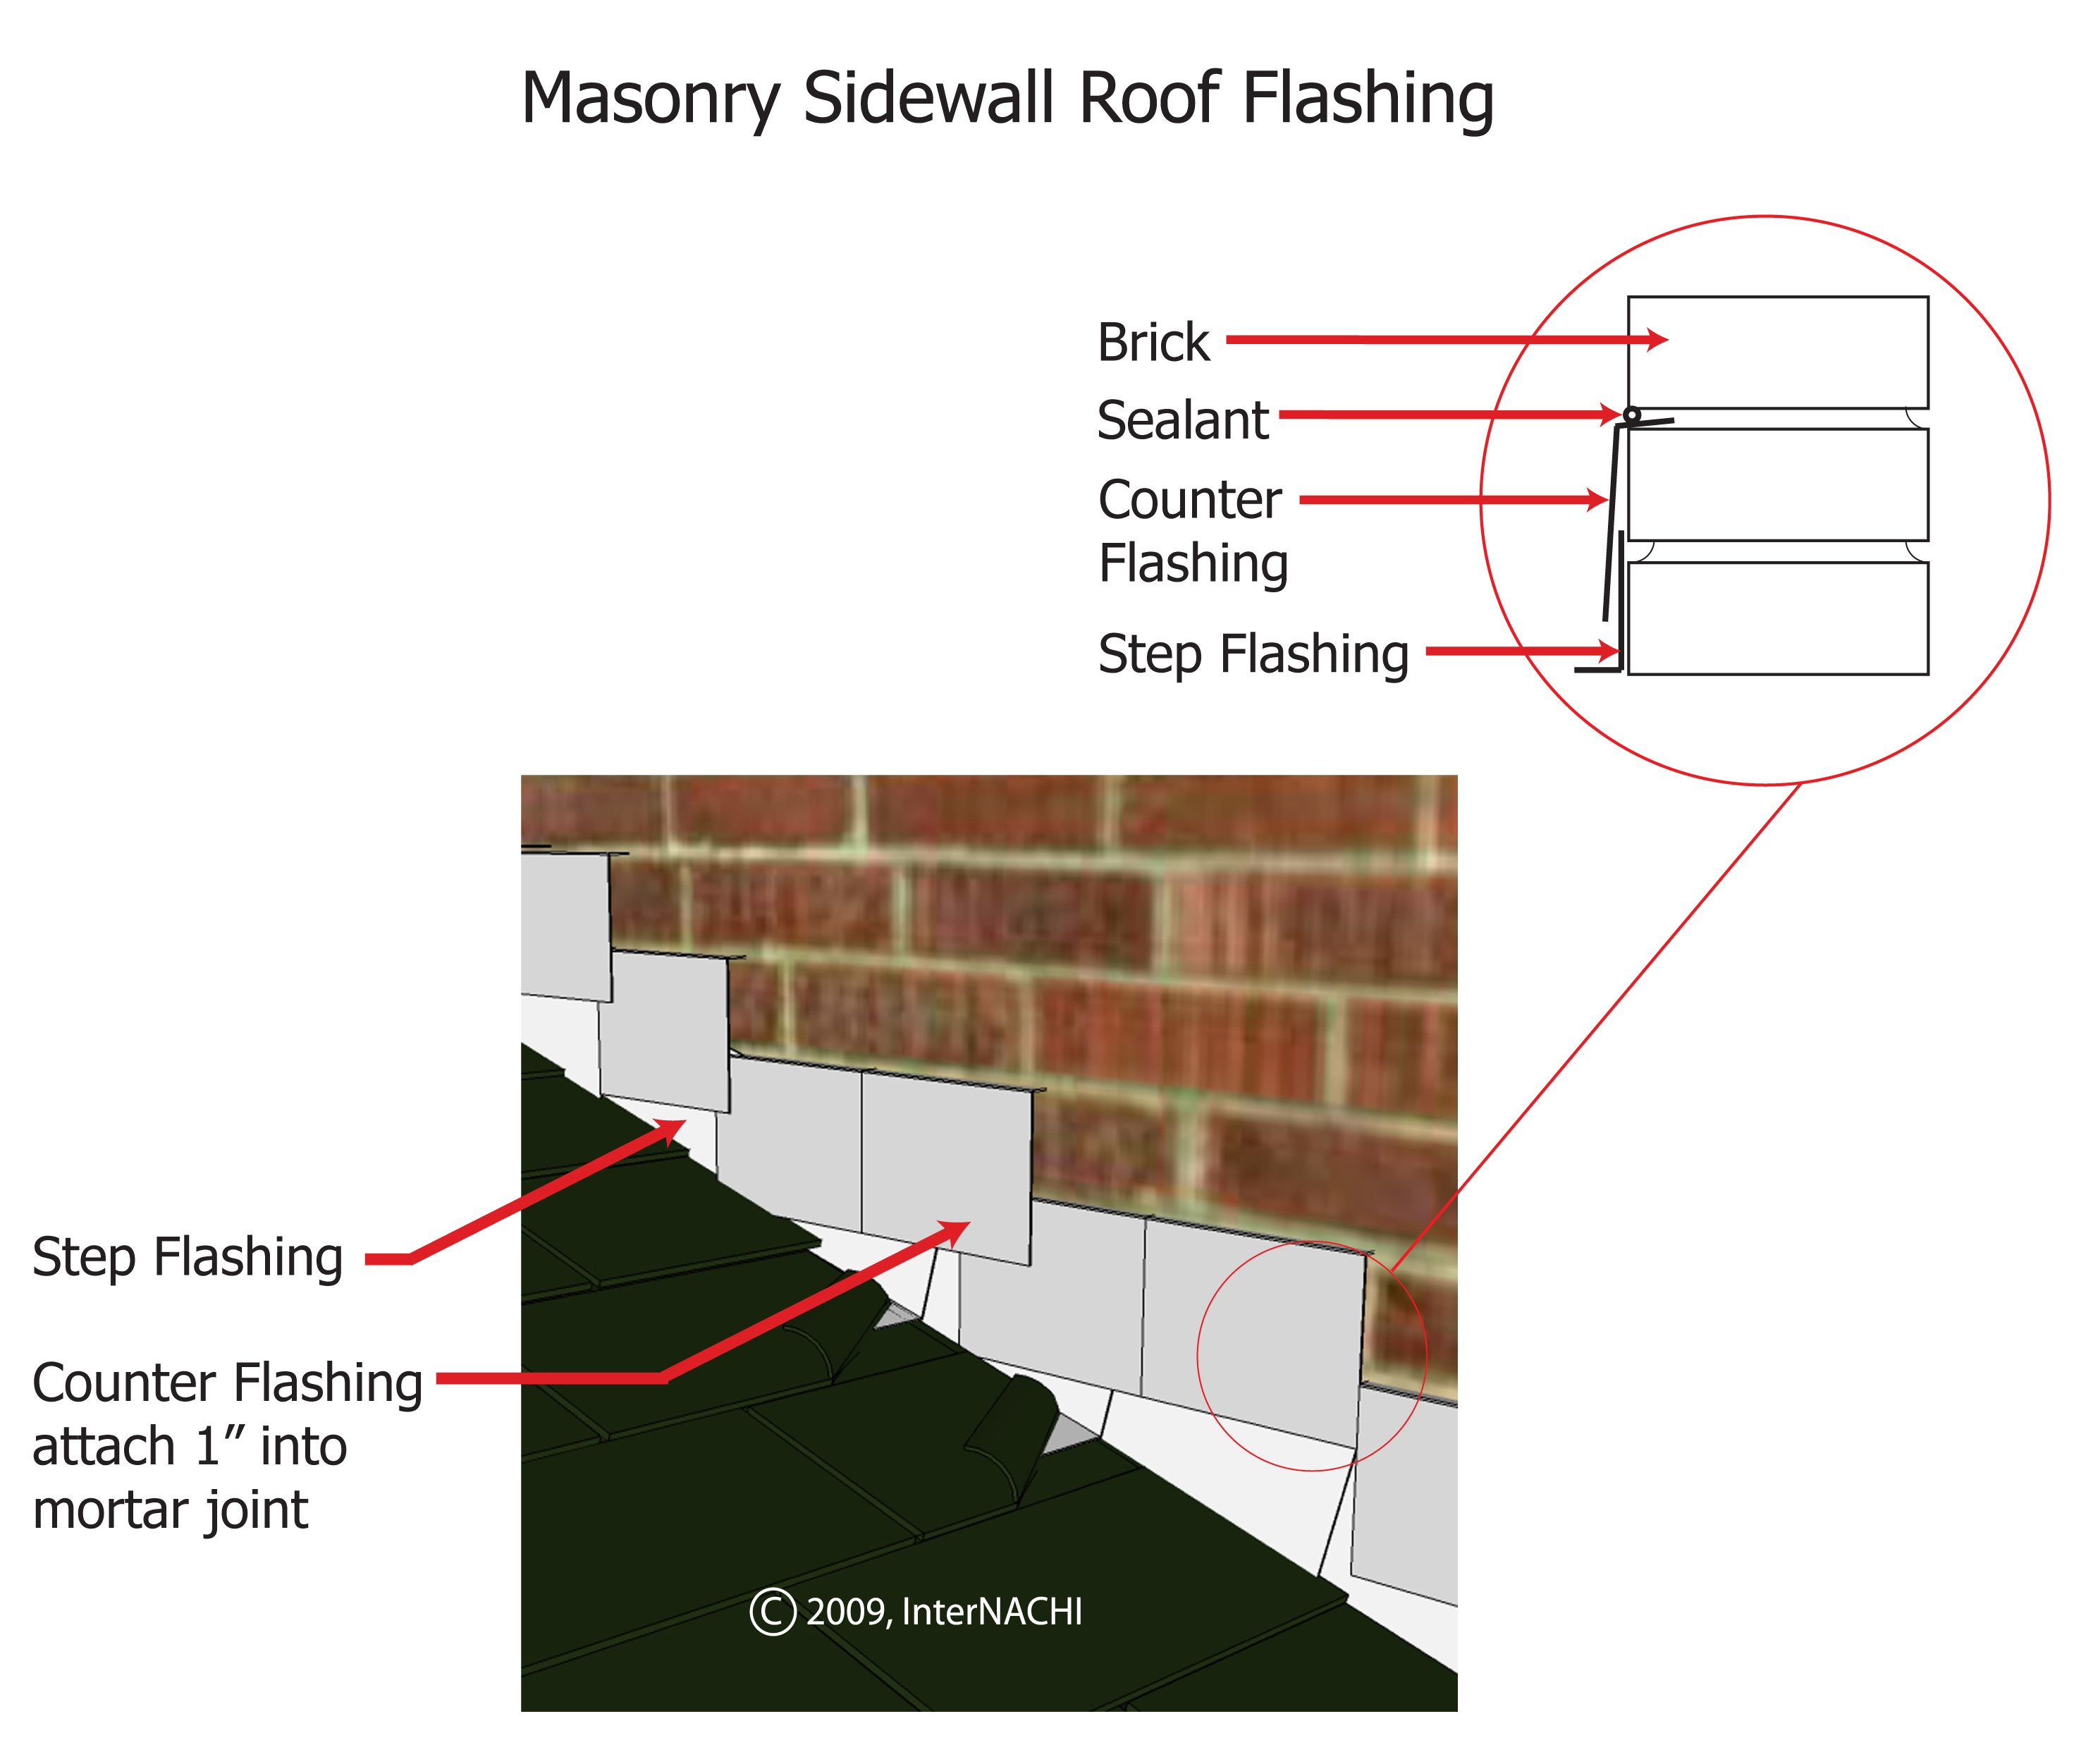 Masonry sidewall roof flashing.